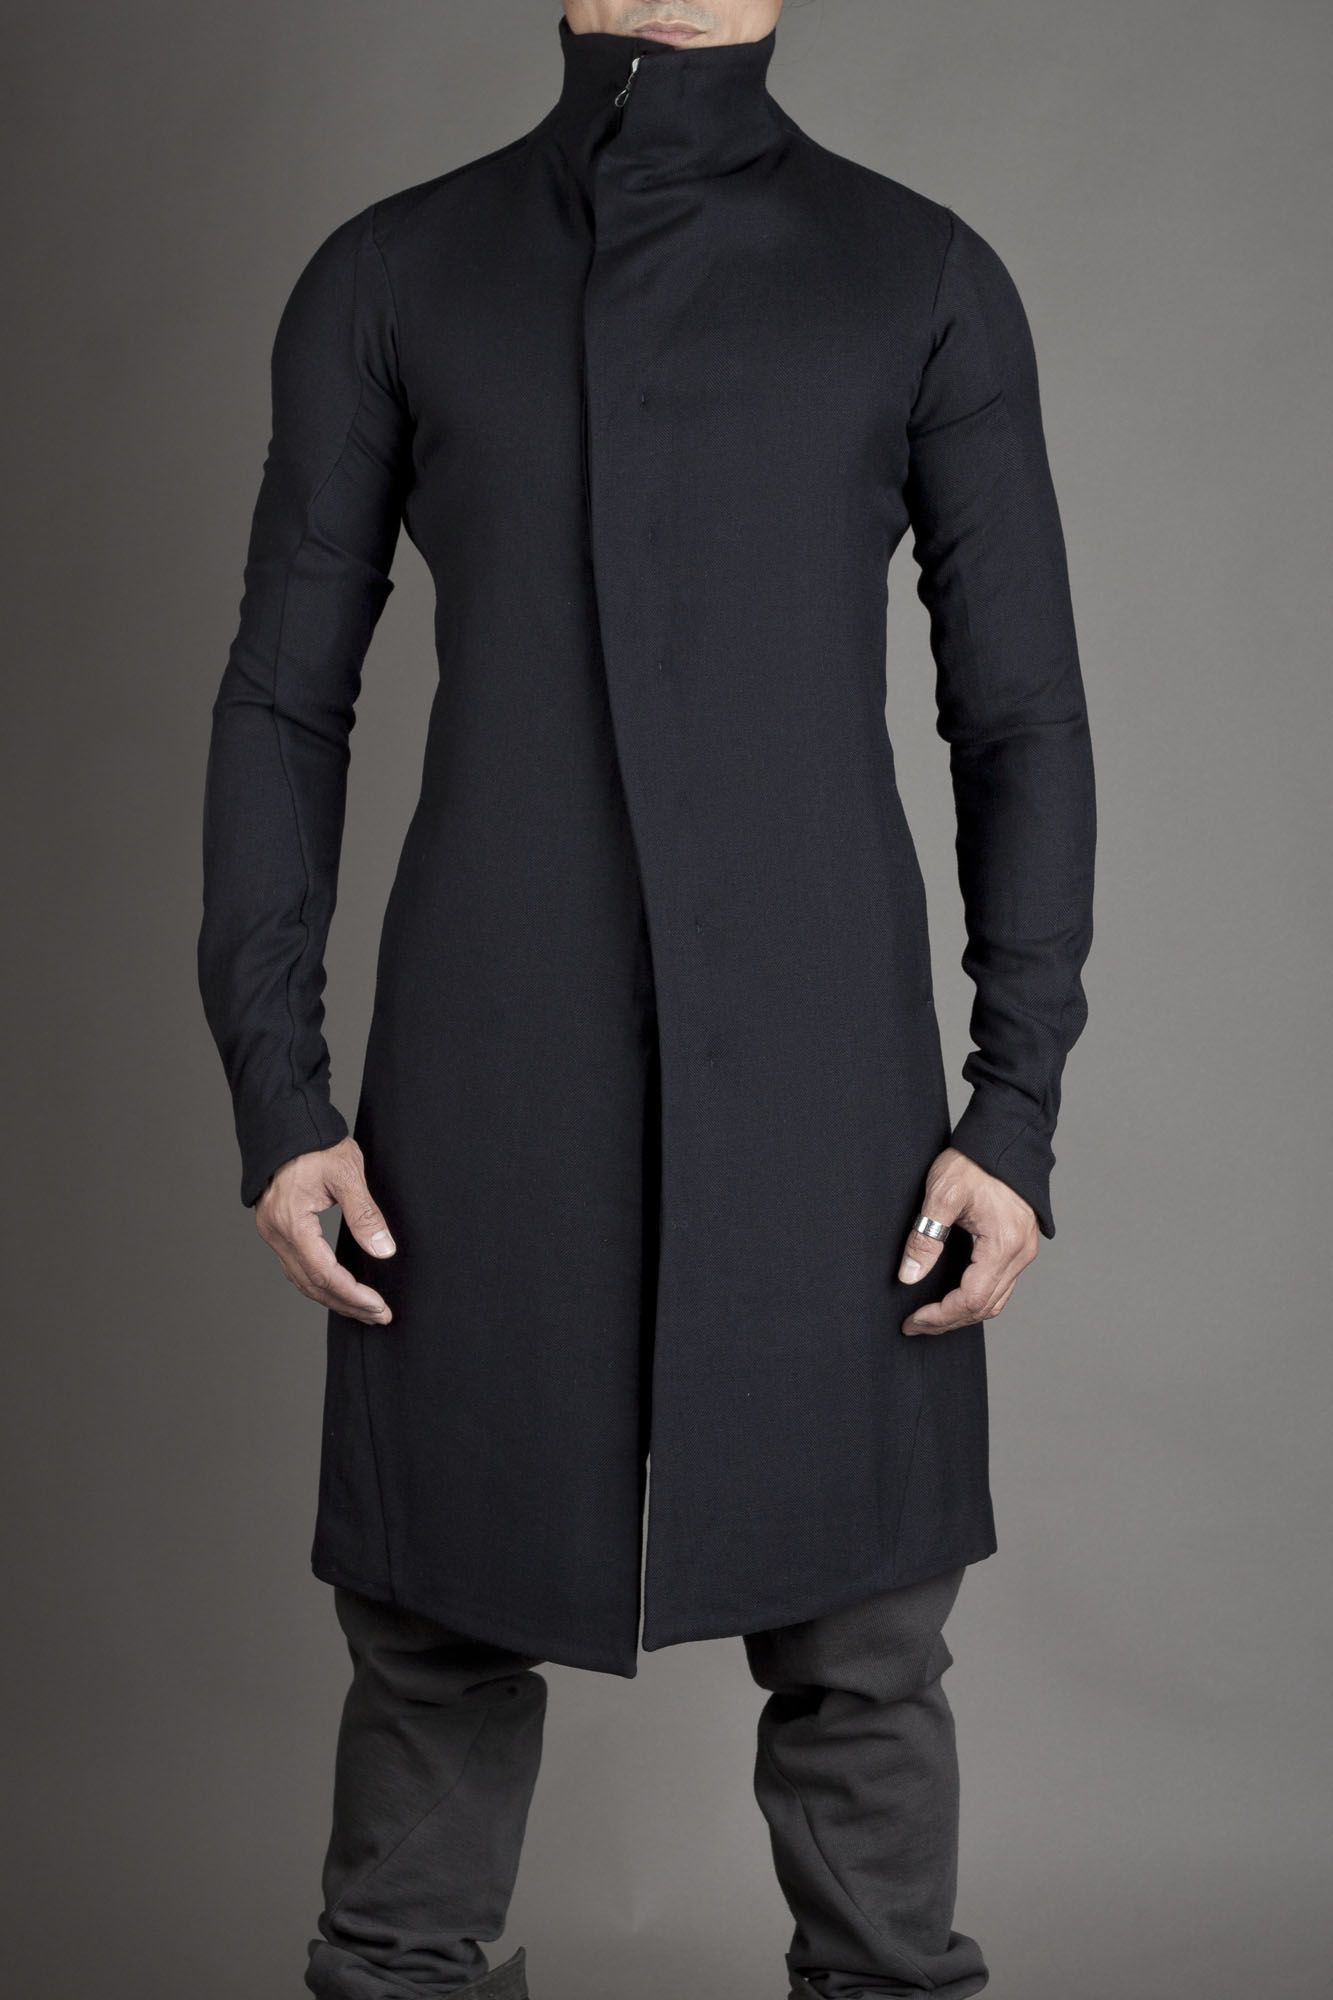 Blue/Black Fitted Coat, by Devoa FCT-NKH | Raddest Men's Fashion ...